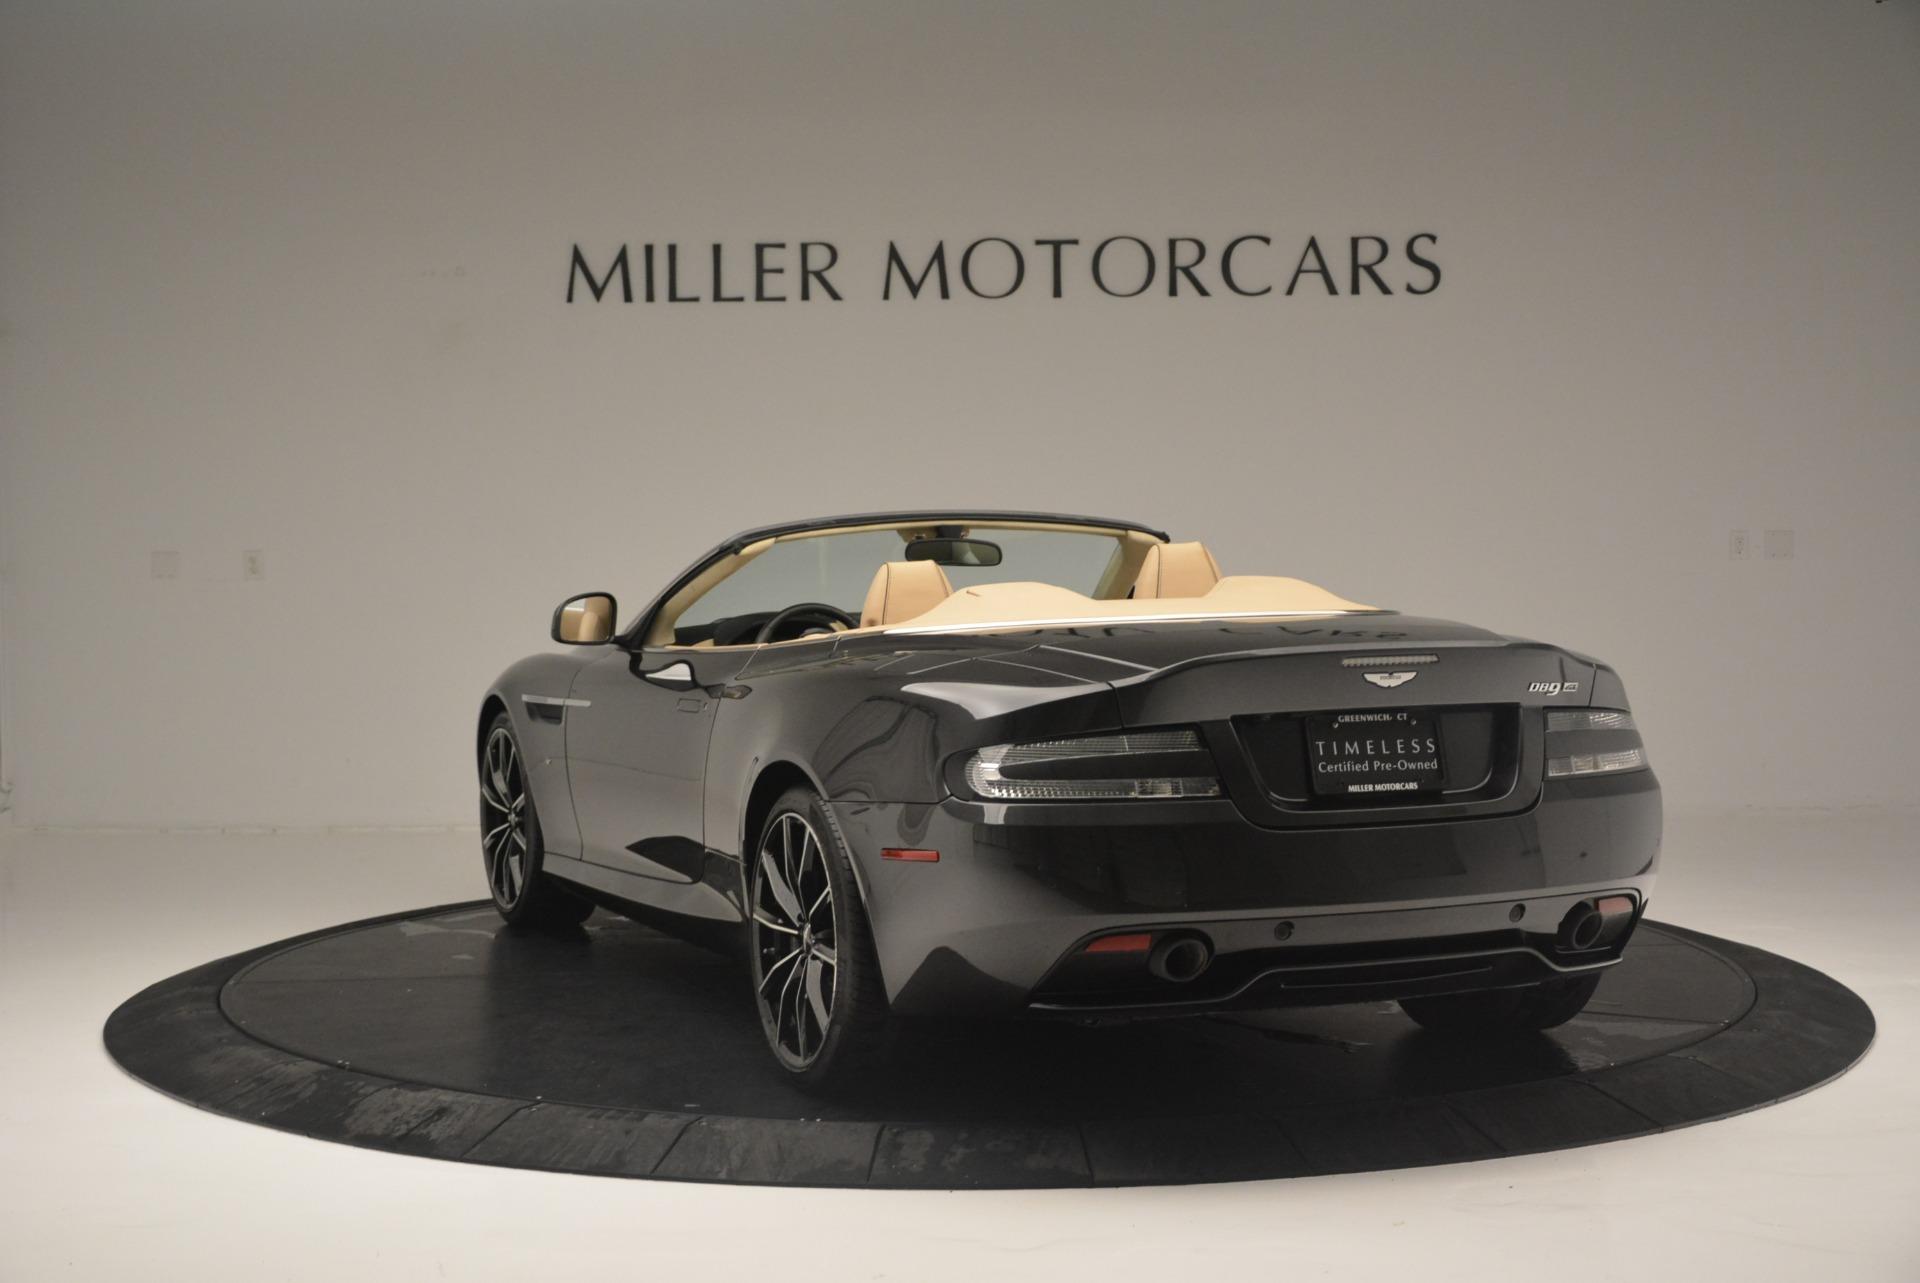 Used 2016 Aston Martin DB9 GT Volante For Sale In Greenwich, CT 2429_p5